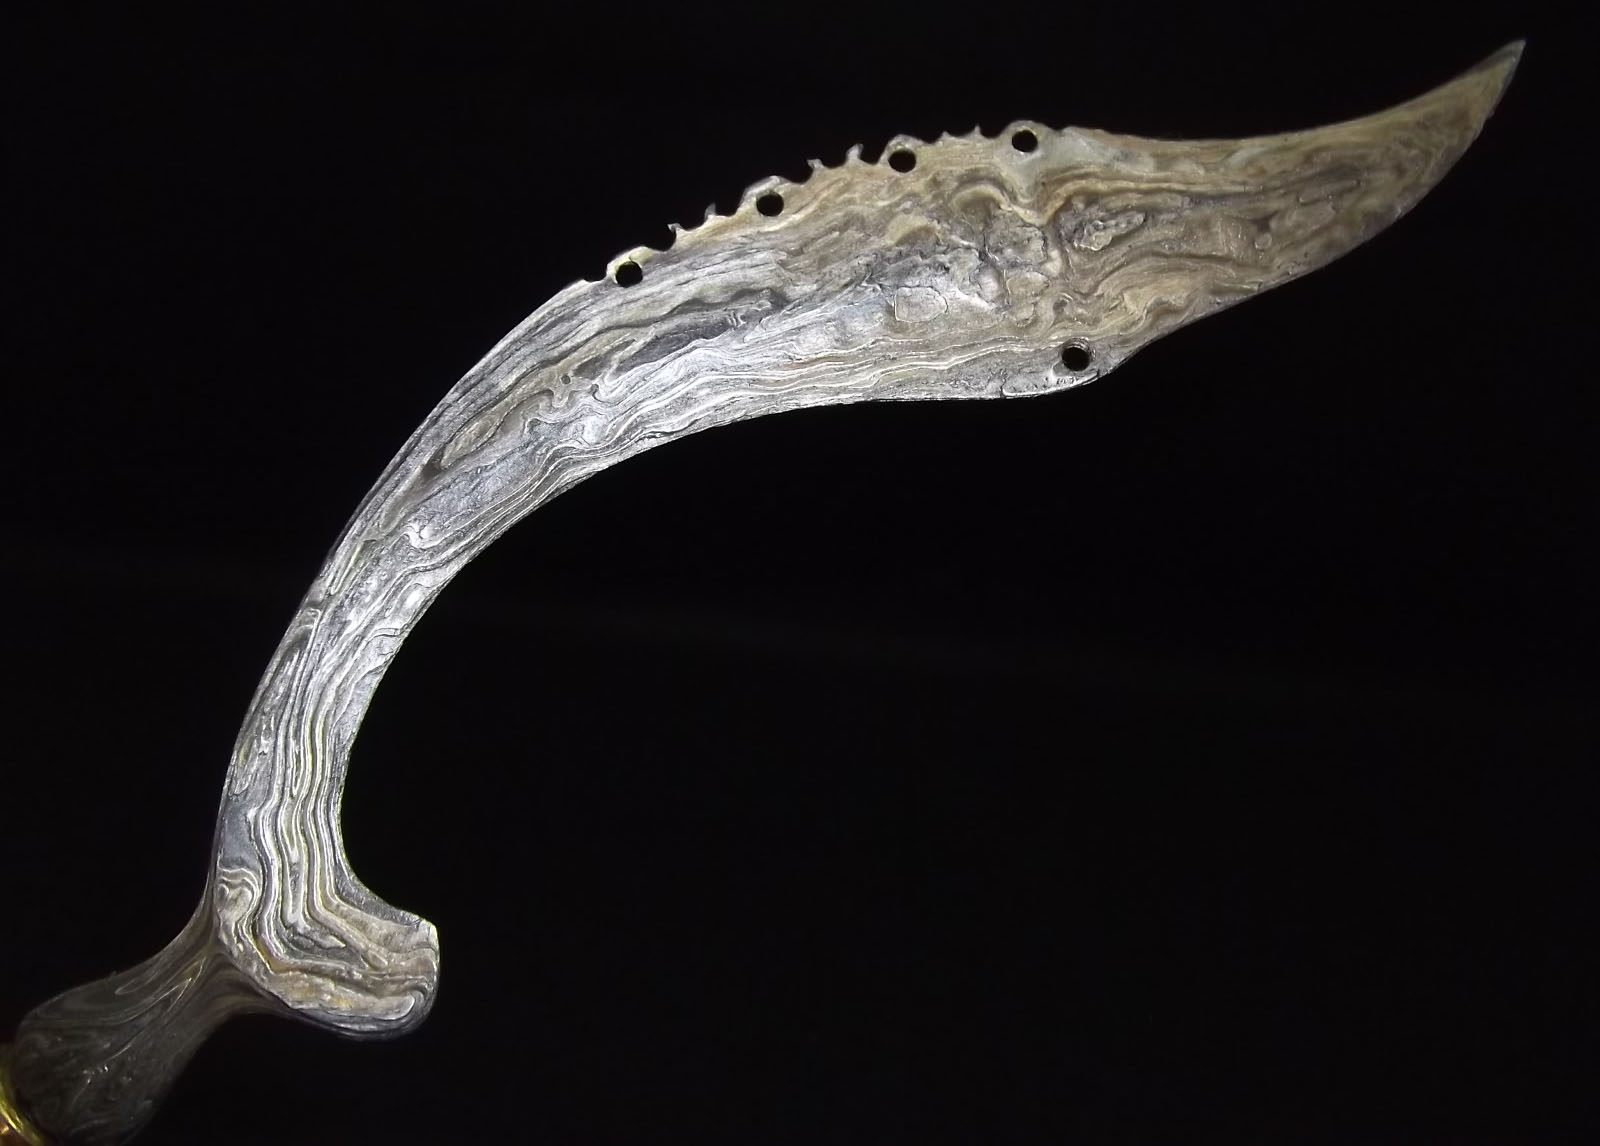 Kujang, Senjata Tradisional Dari Jawa Barat